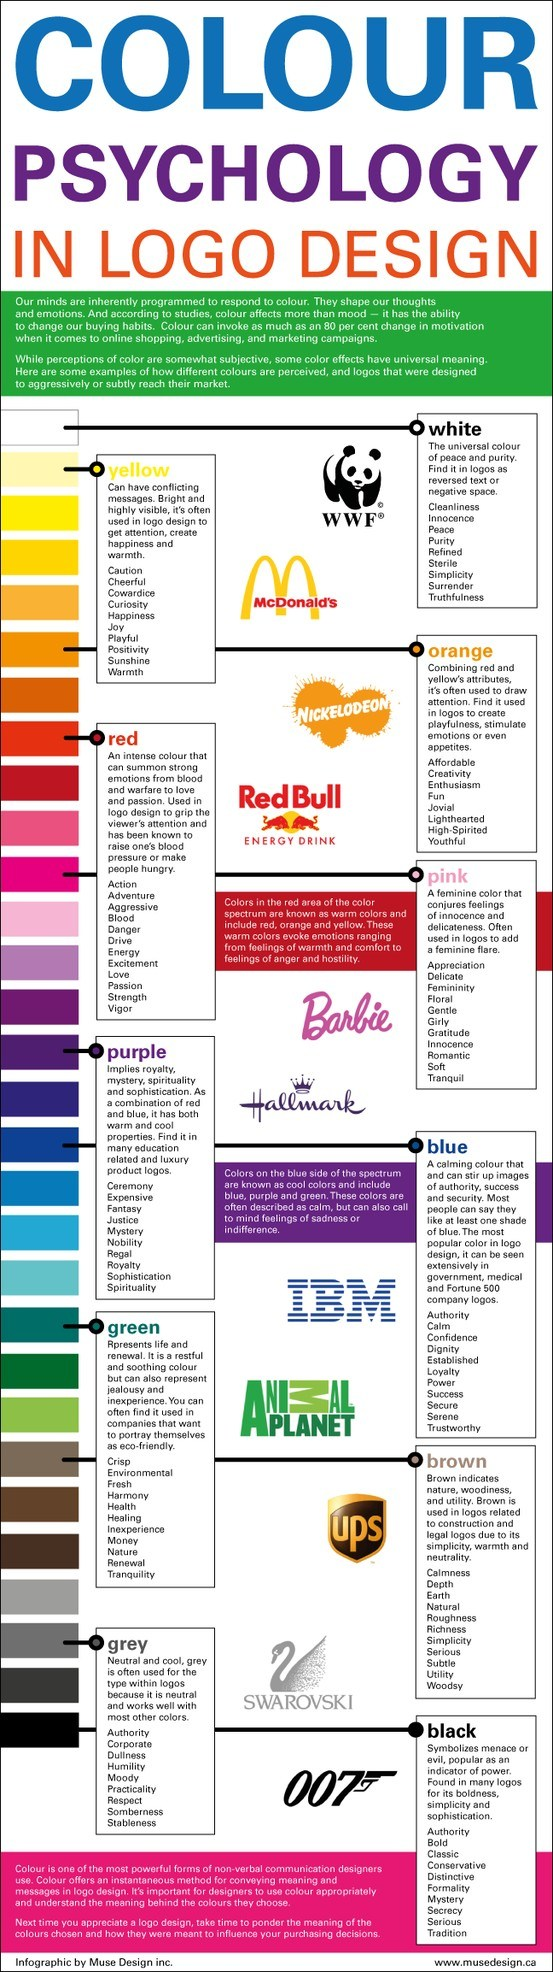 Colour Psychology in Logo Design | Infographic  |  Design: Muse Design Inc  |  musedesign.ca